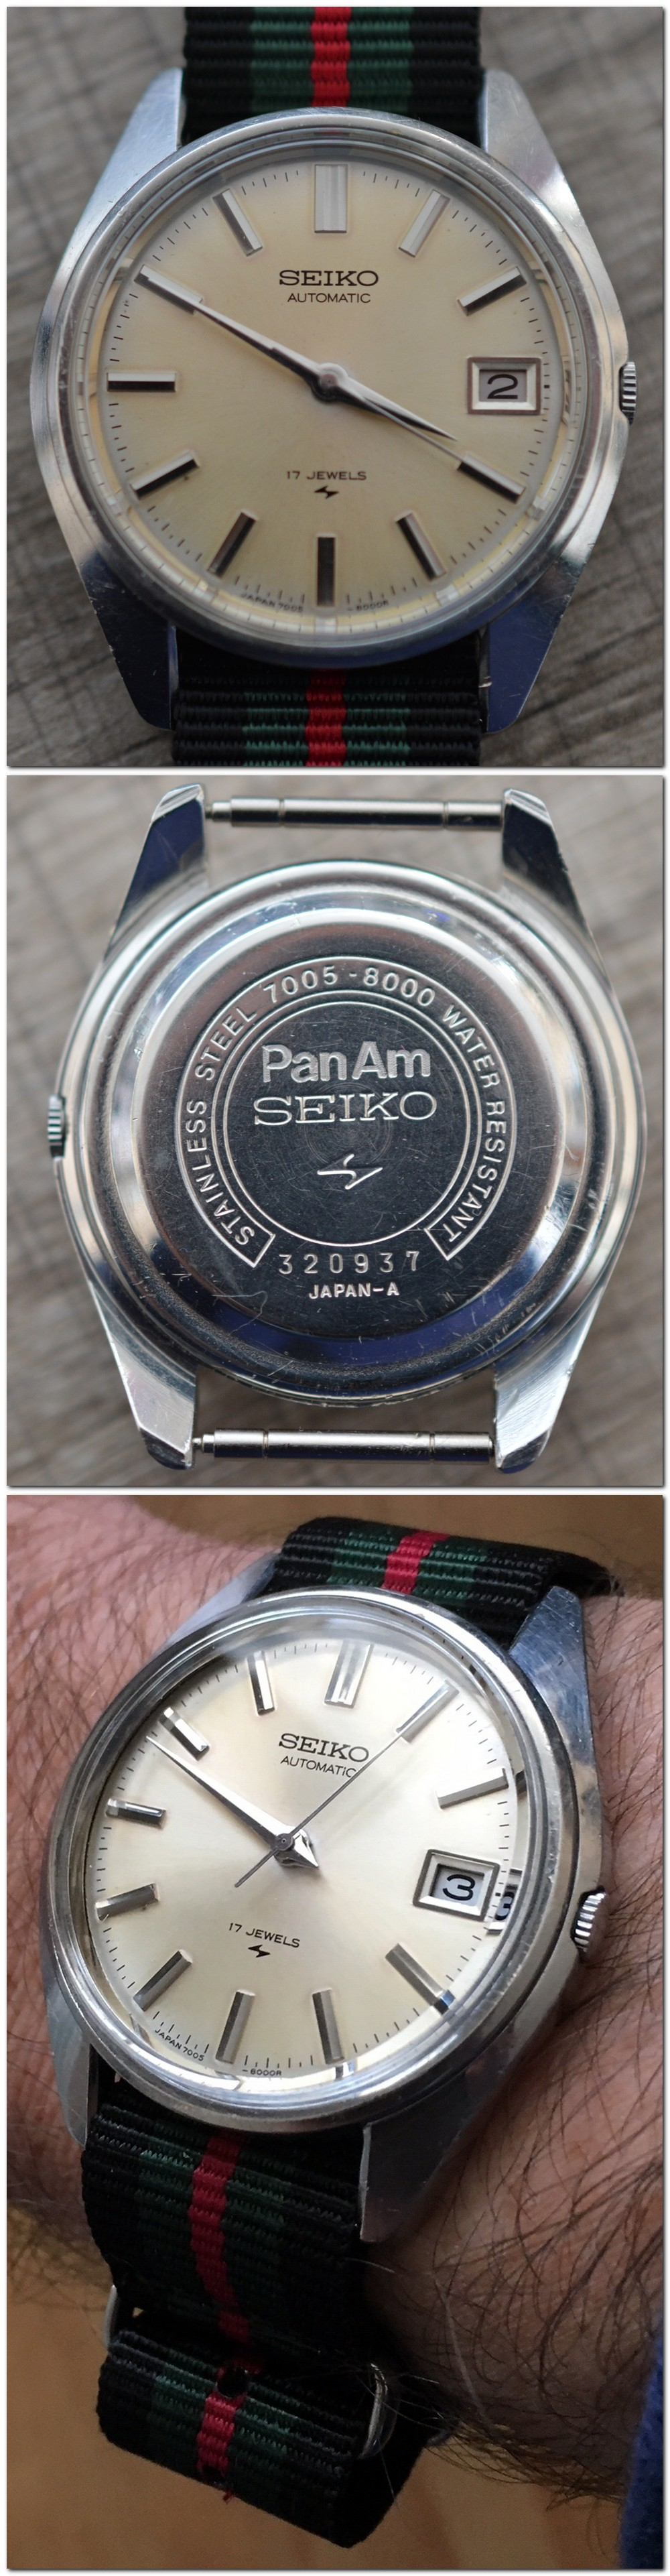 SEIKO & PanAm sur une 7005-8000 2018-111